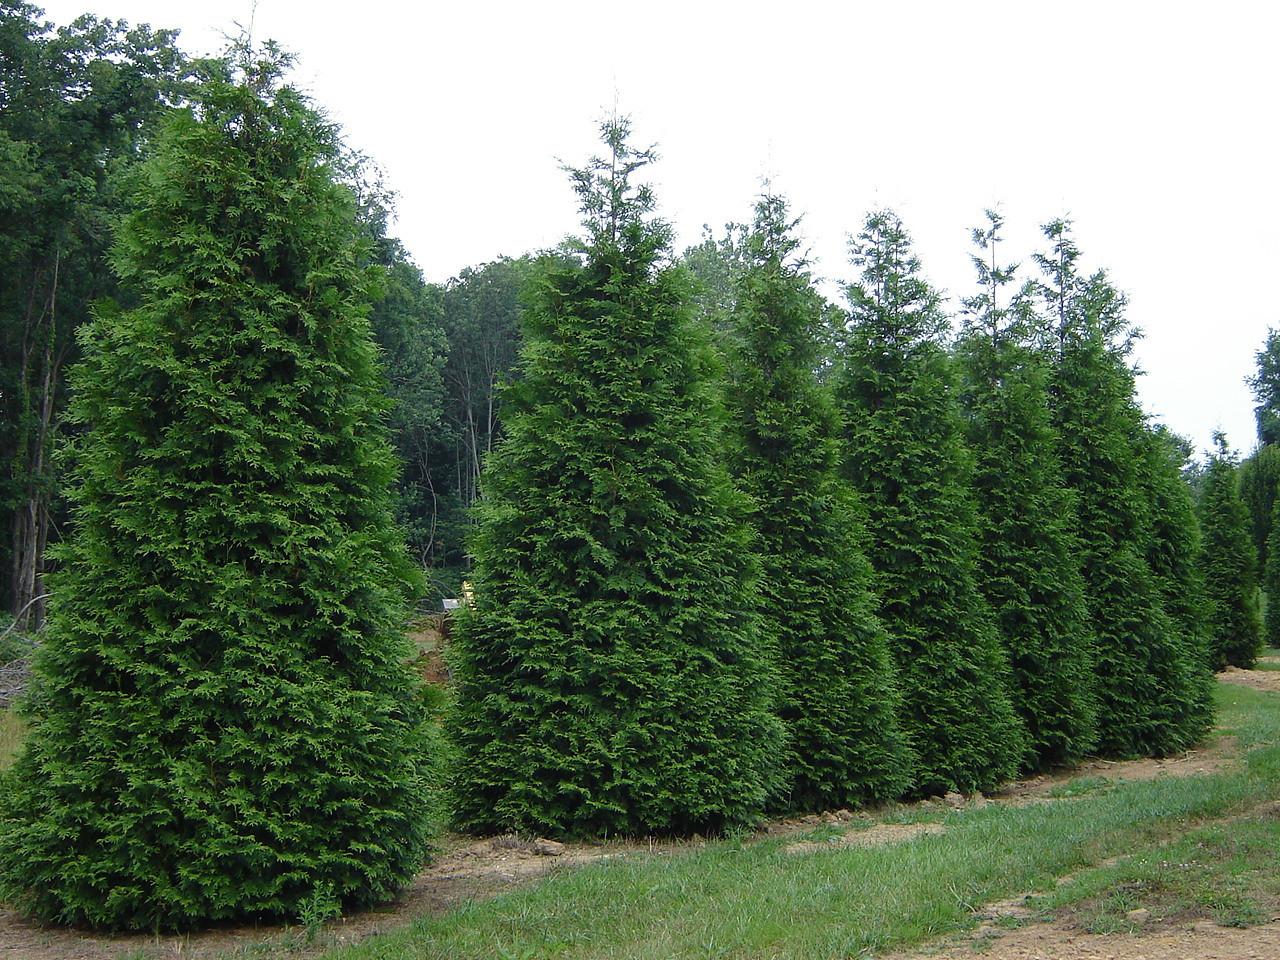 Thuja plicata 'Green Giant'  Green Giant Arborvitae 30-40'+ mature height.  Fantastic screening tree!